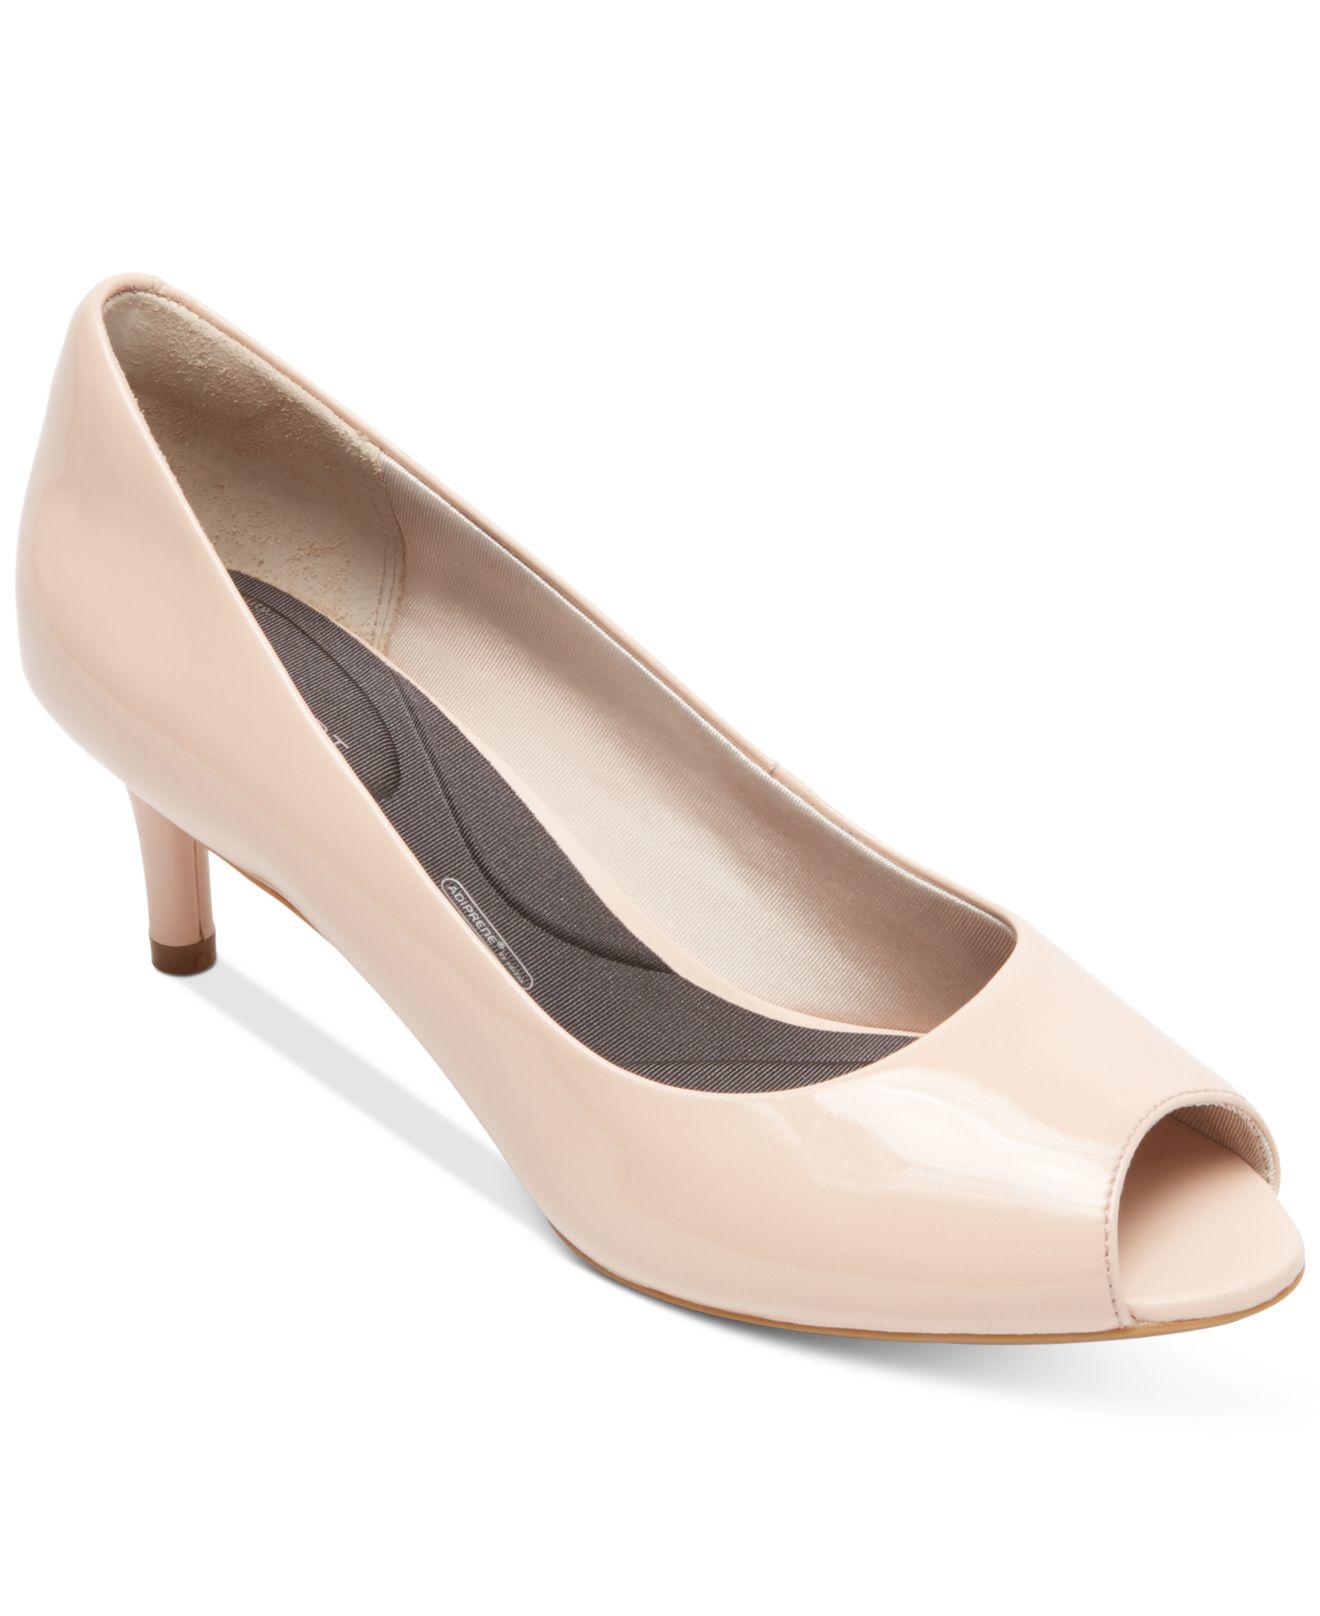 Peep Toe Kitten Heel Shoes